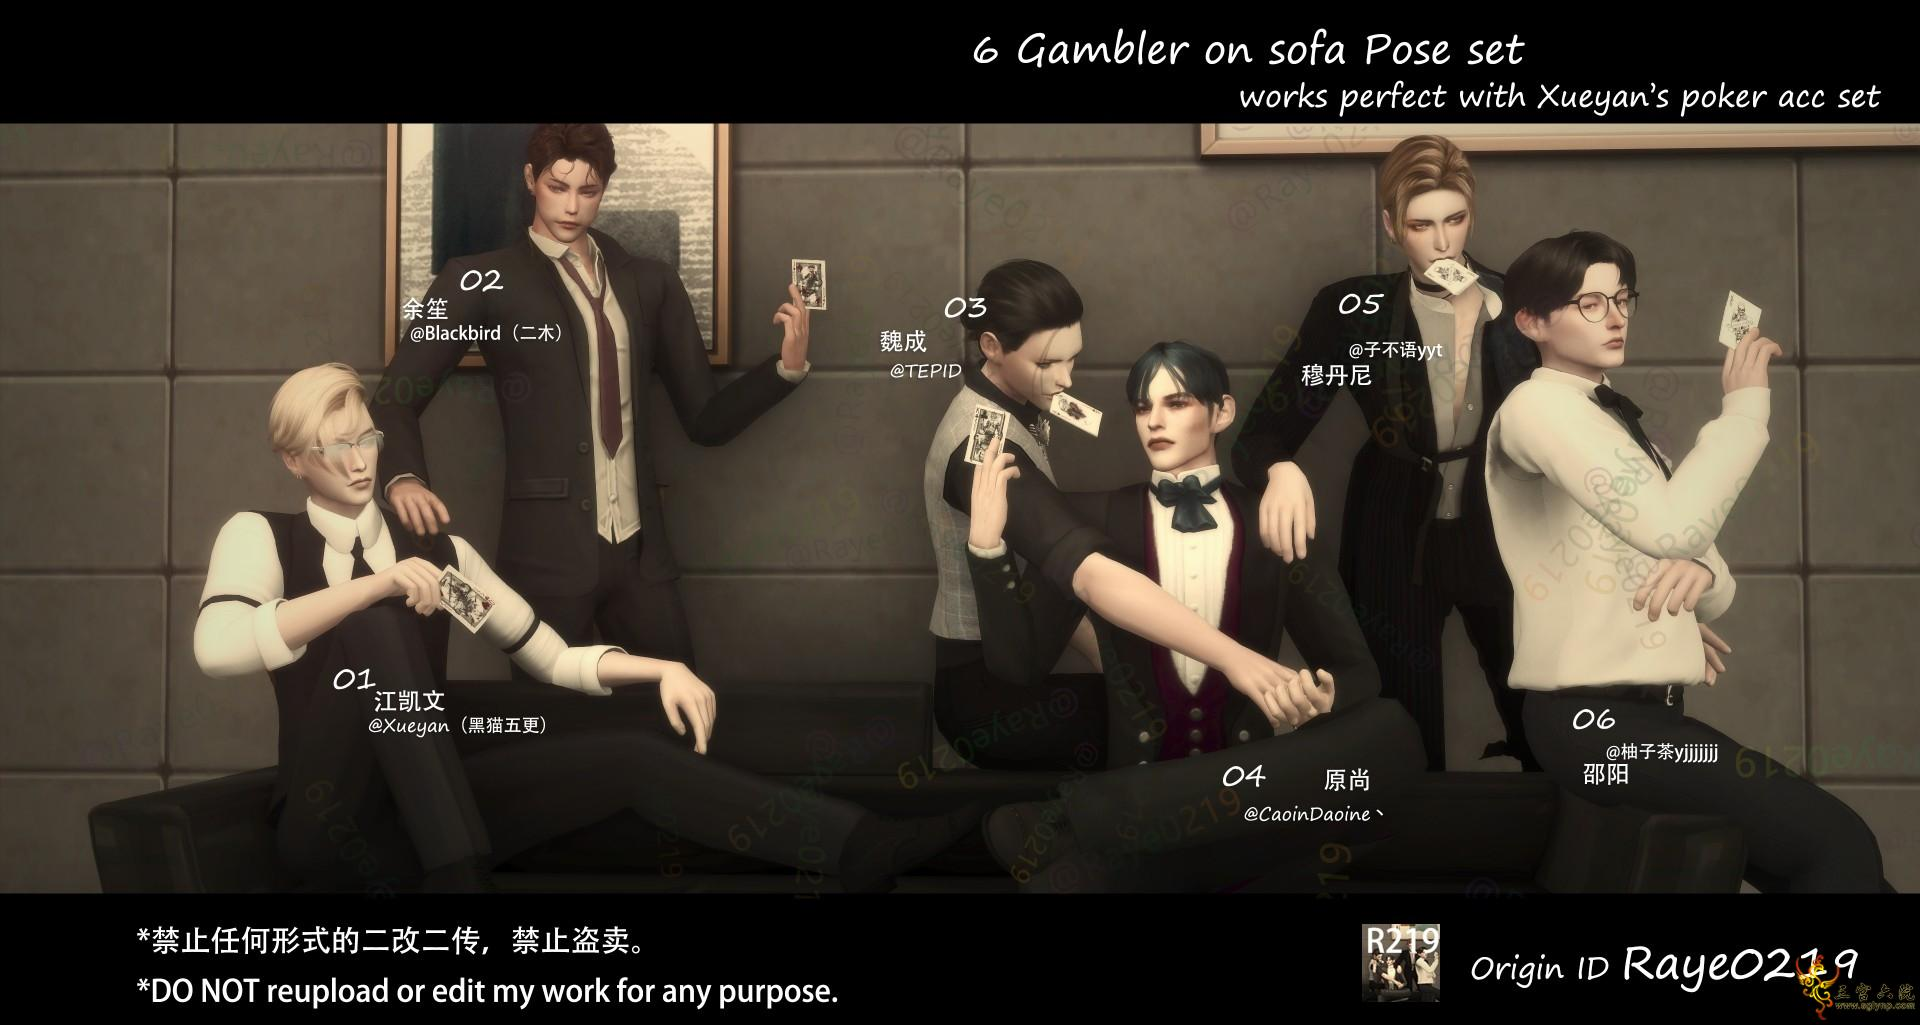 [R219] pose01【6 gambler on sofa】watermark.png